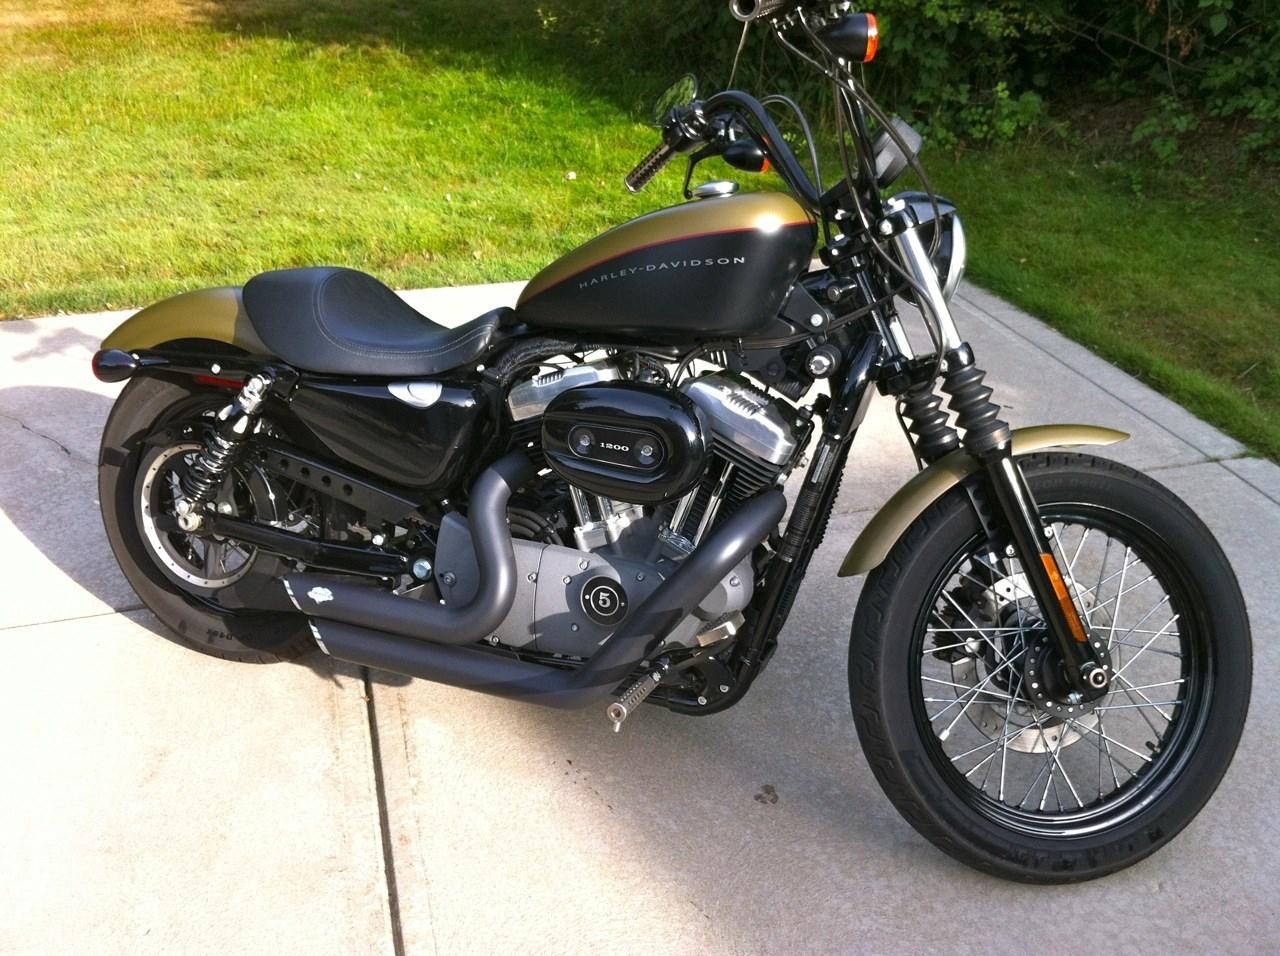 Used Harley Davidson Motorcycles For Sale San Marcos Tx >> 2008 Harley-Davidson® XL1200N Sportster® 1200 Nightster® (Olive Drab And Black Denim ...